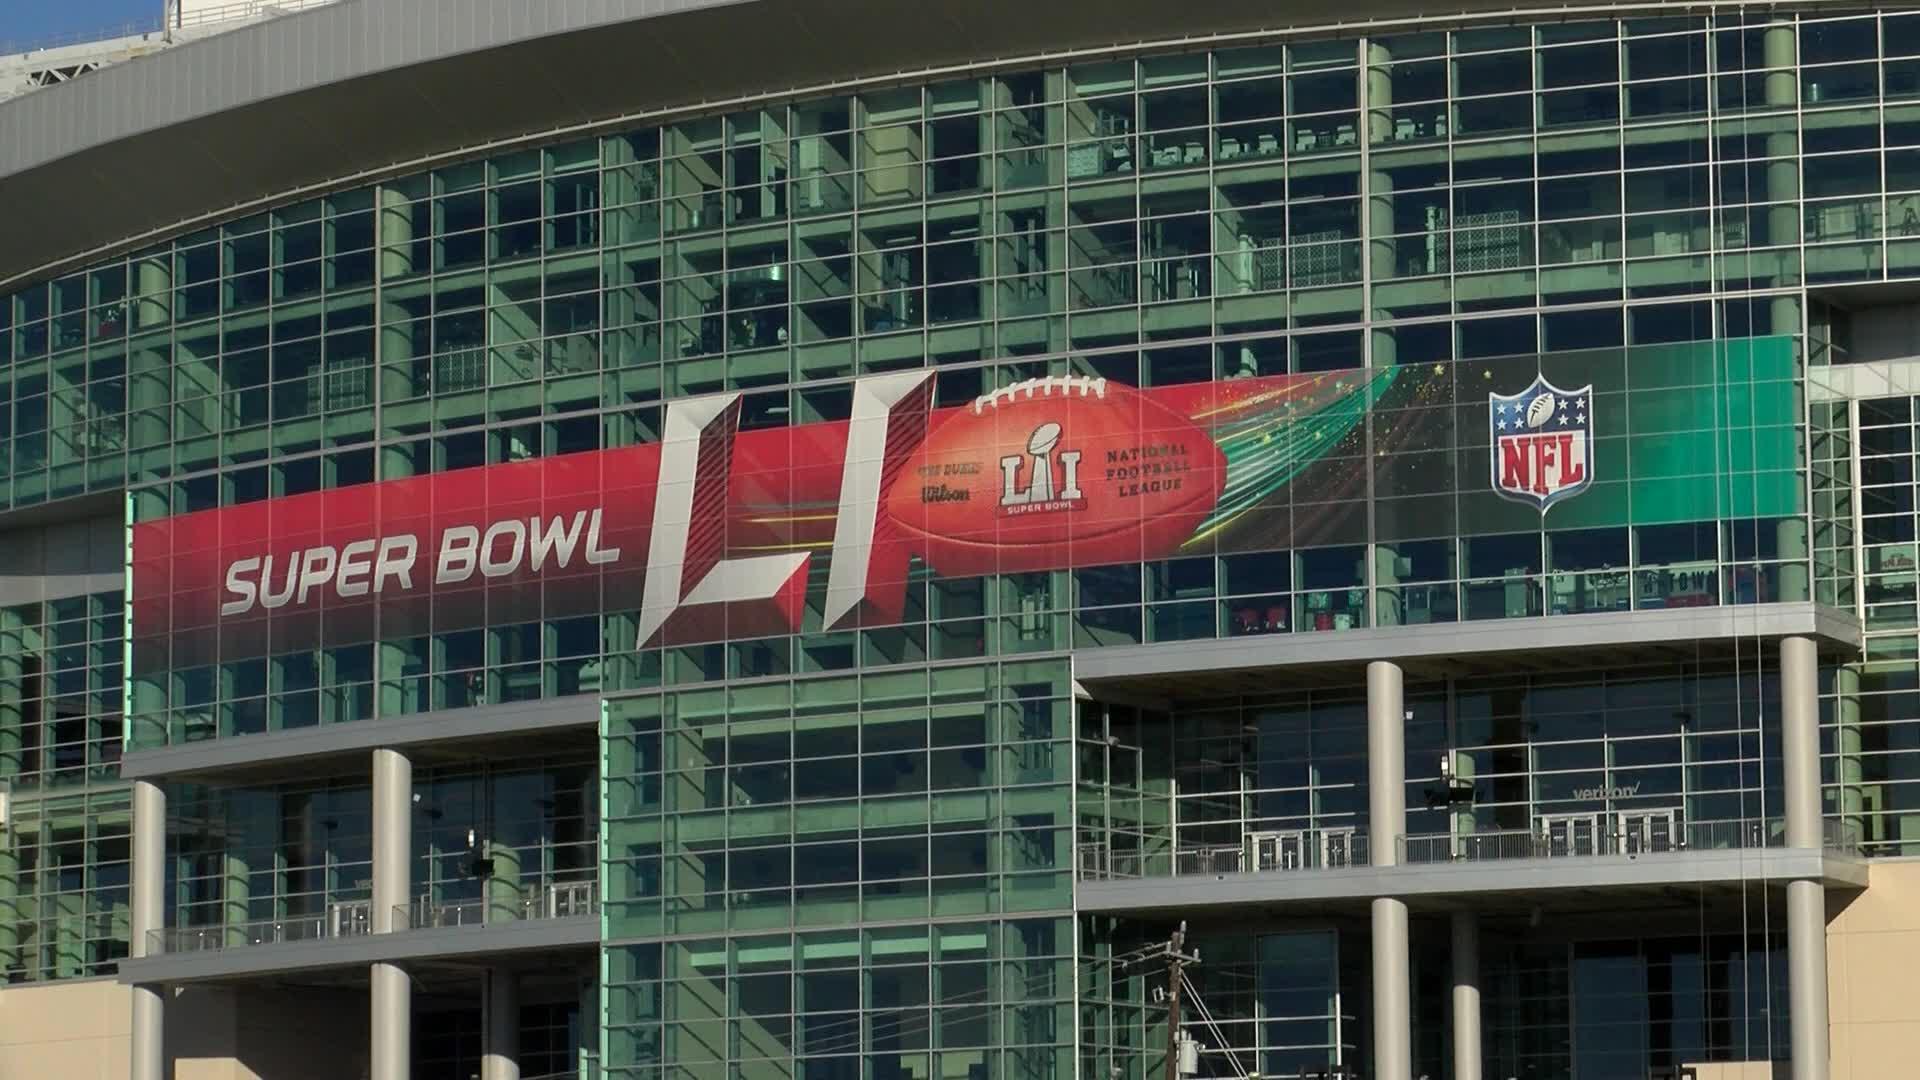 Super Bowl LI_237515